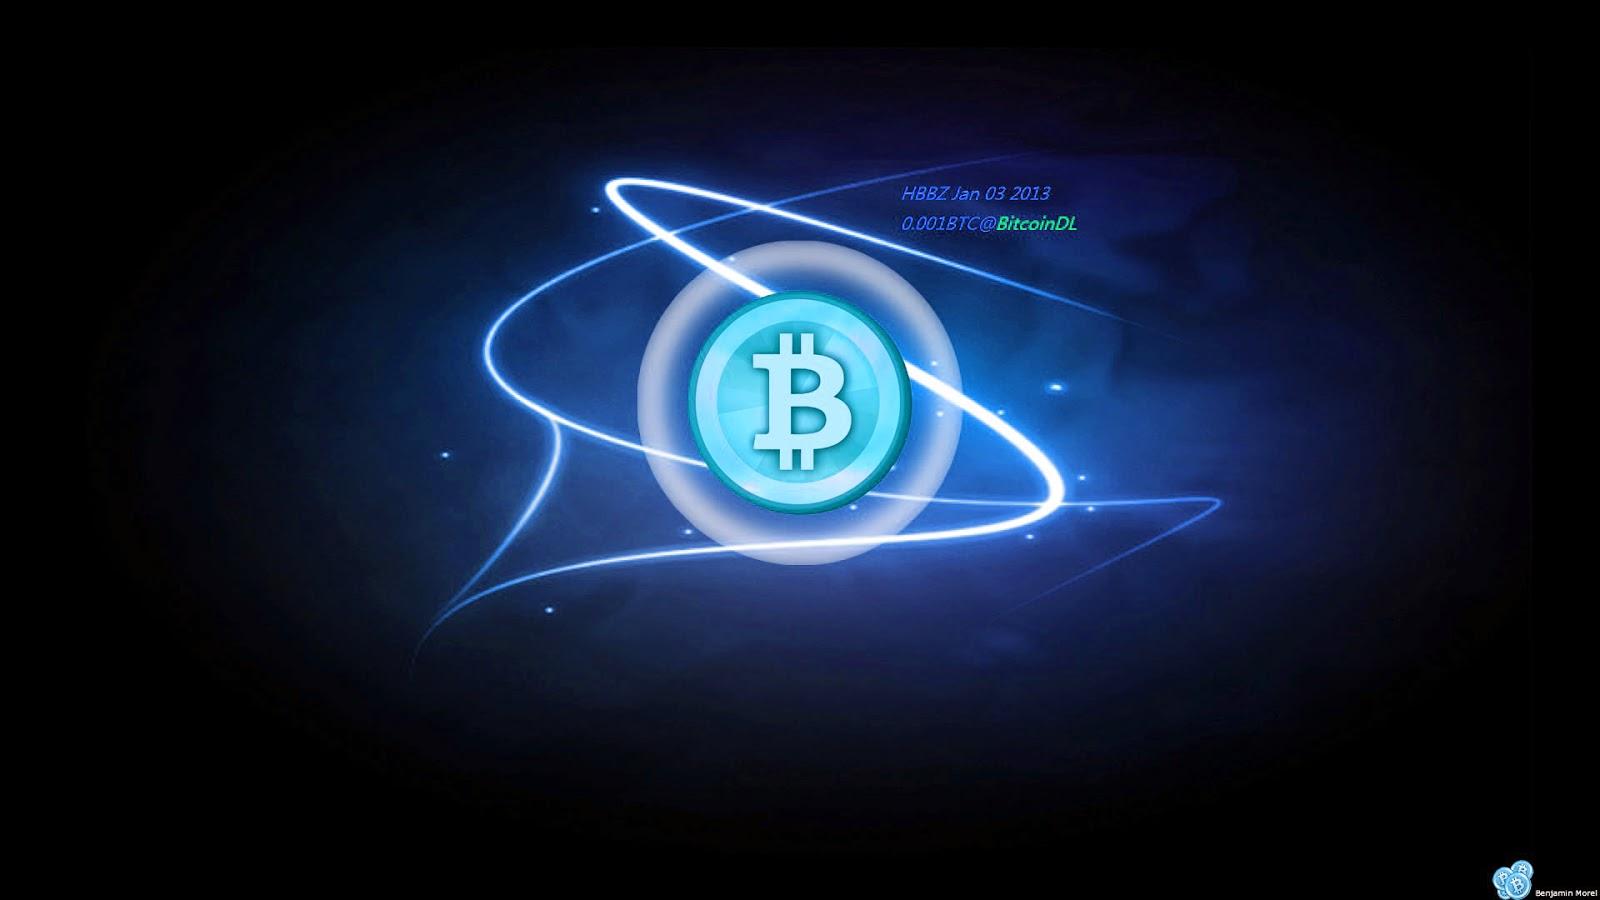 Bitcoin Wallpaper Amazing Bitcoin Btc Desktop Wallpaper 7 1600x900